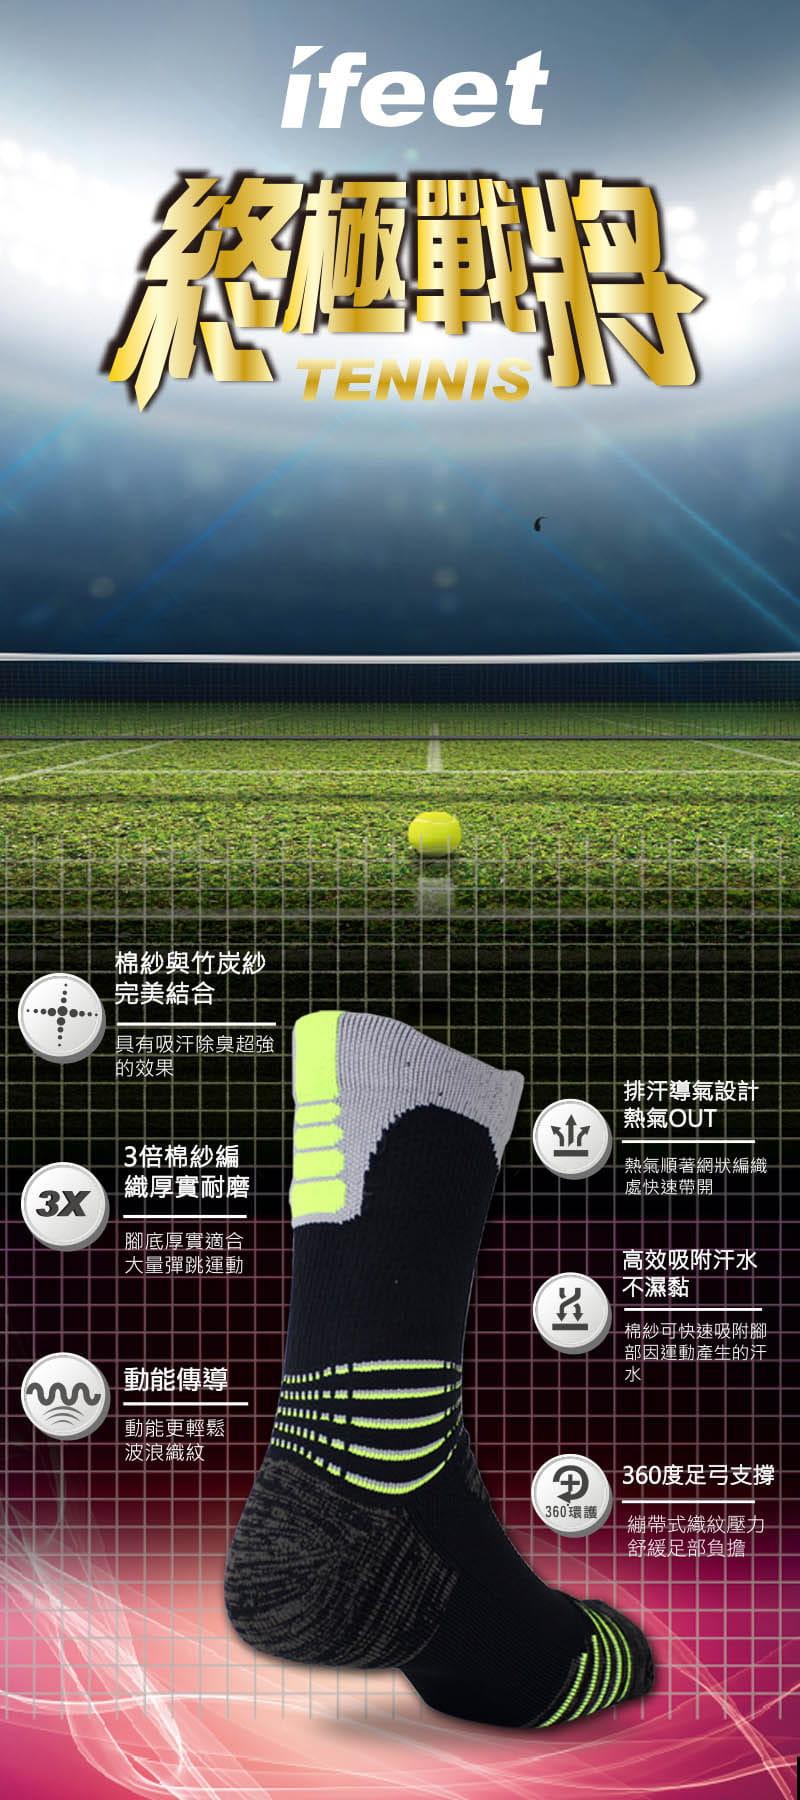 【IFEET】(9824-28)全方位足弓壓力運動網球襪 2